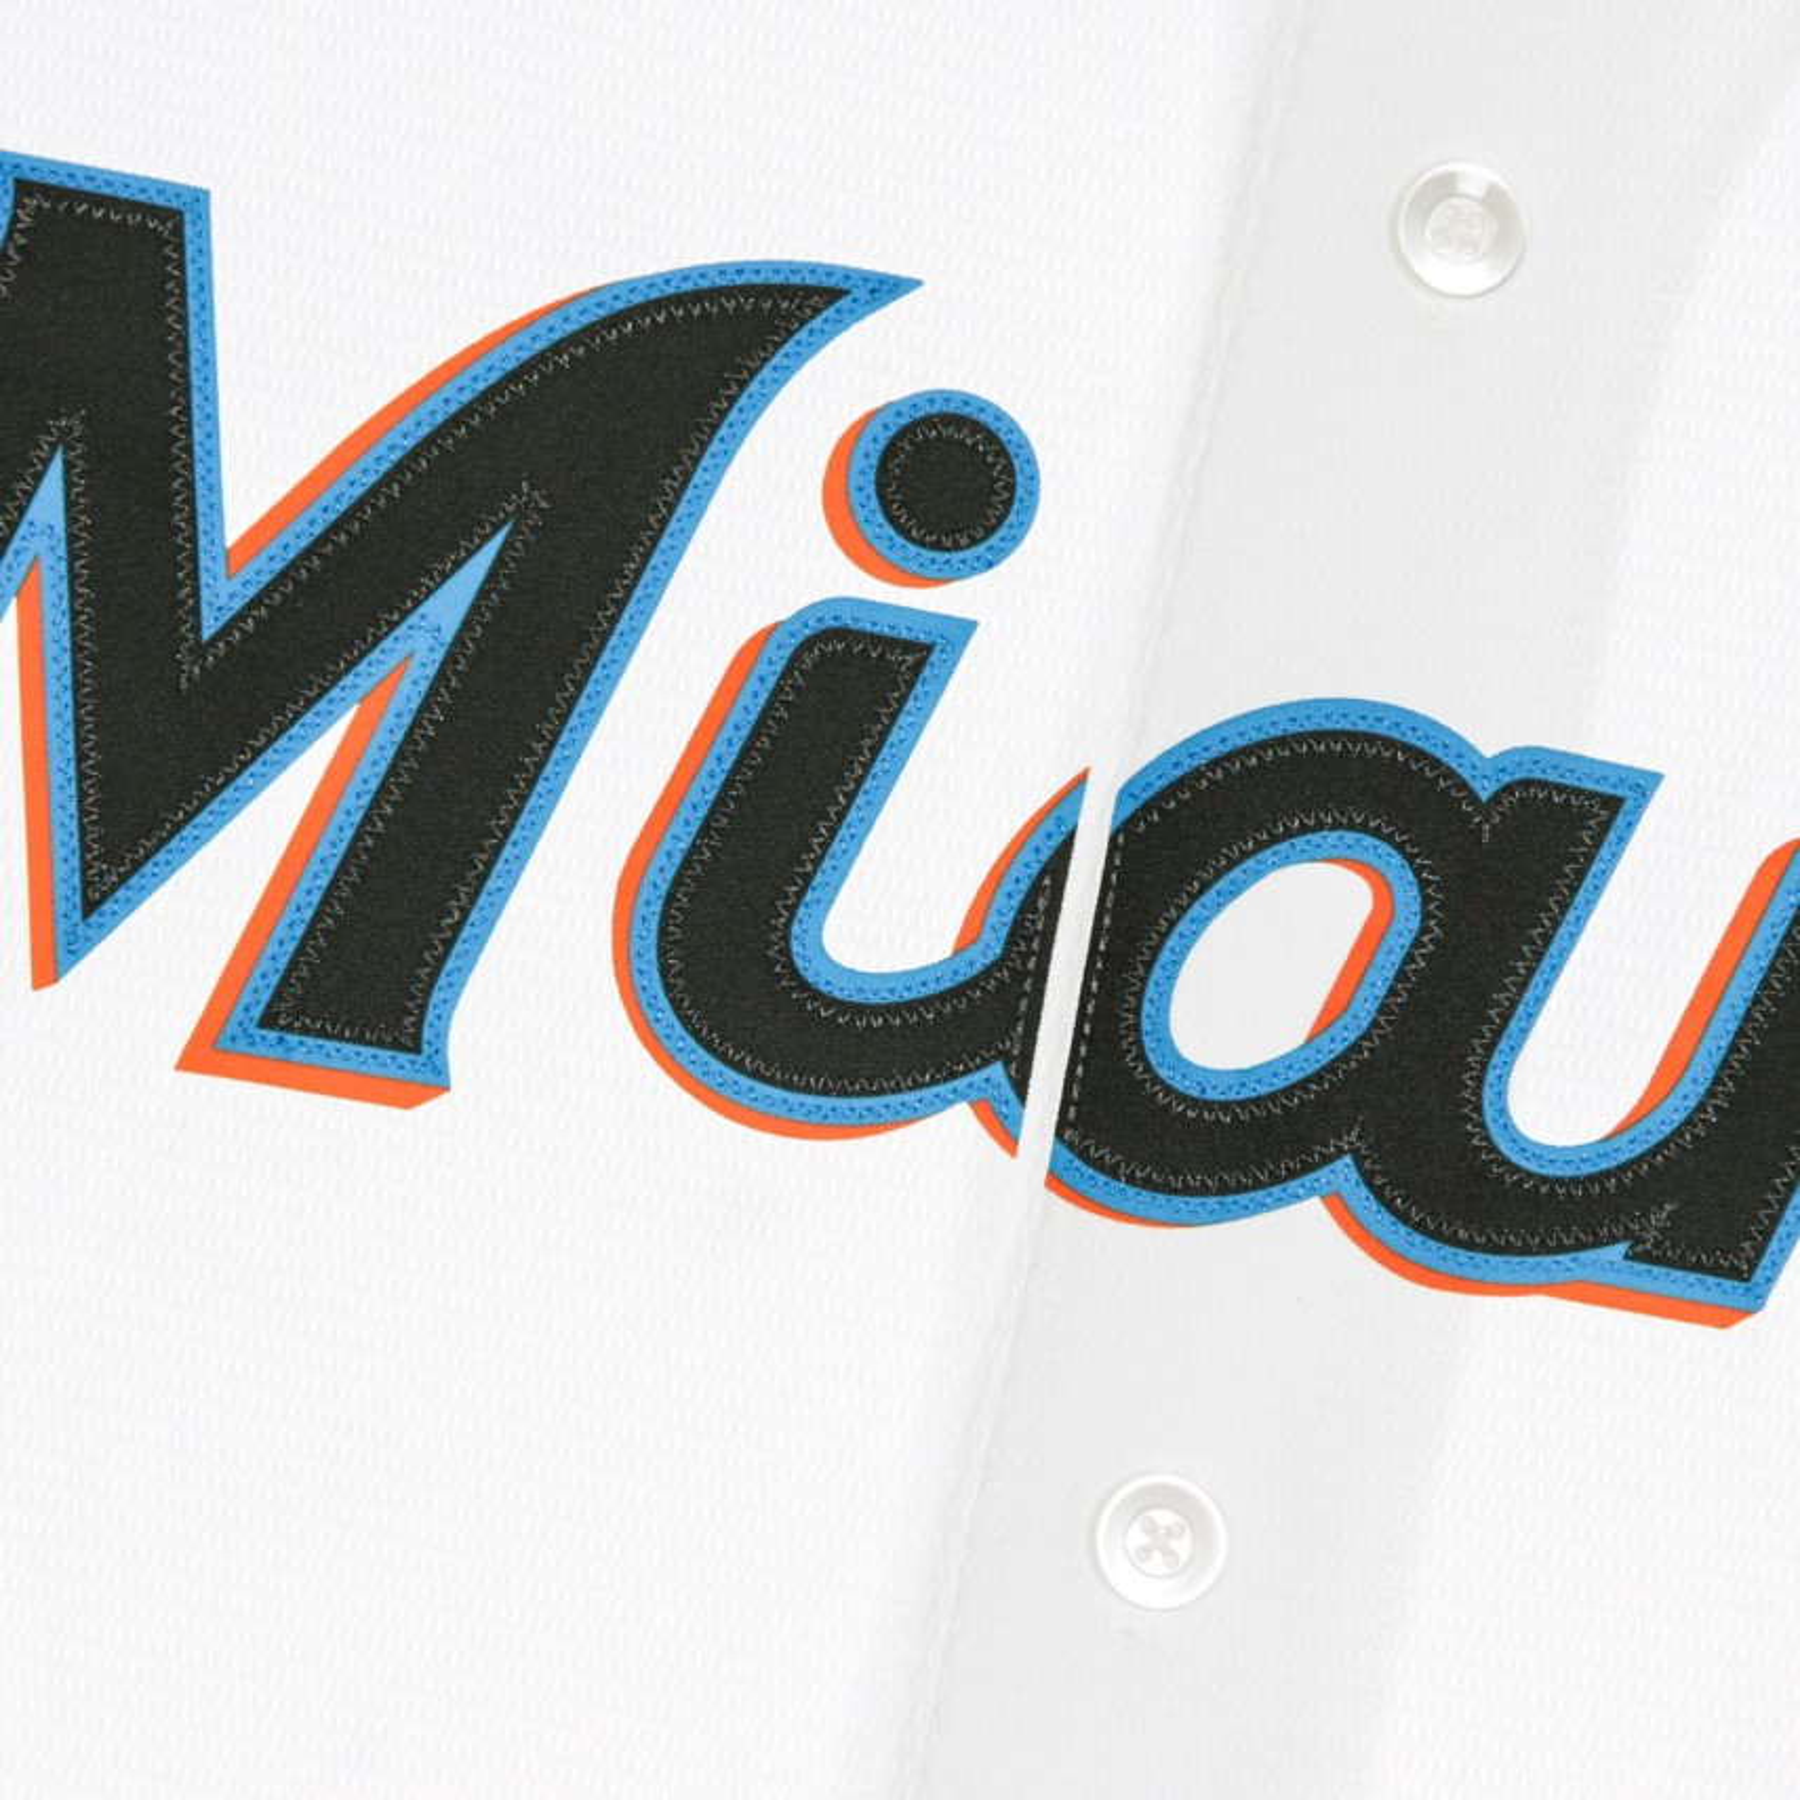 CASACCA BASEBALL MLB OFFICIAL REPLICA HOME JERSEY MIAMAR